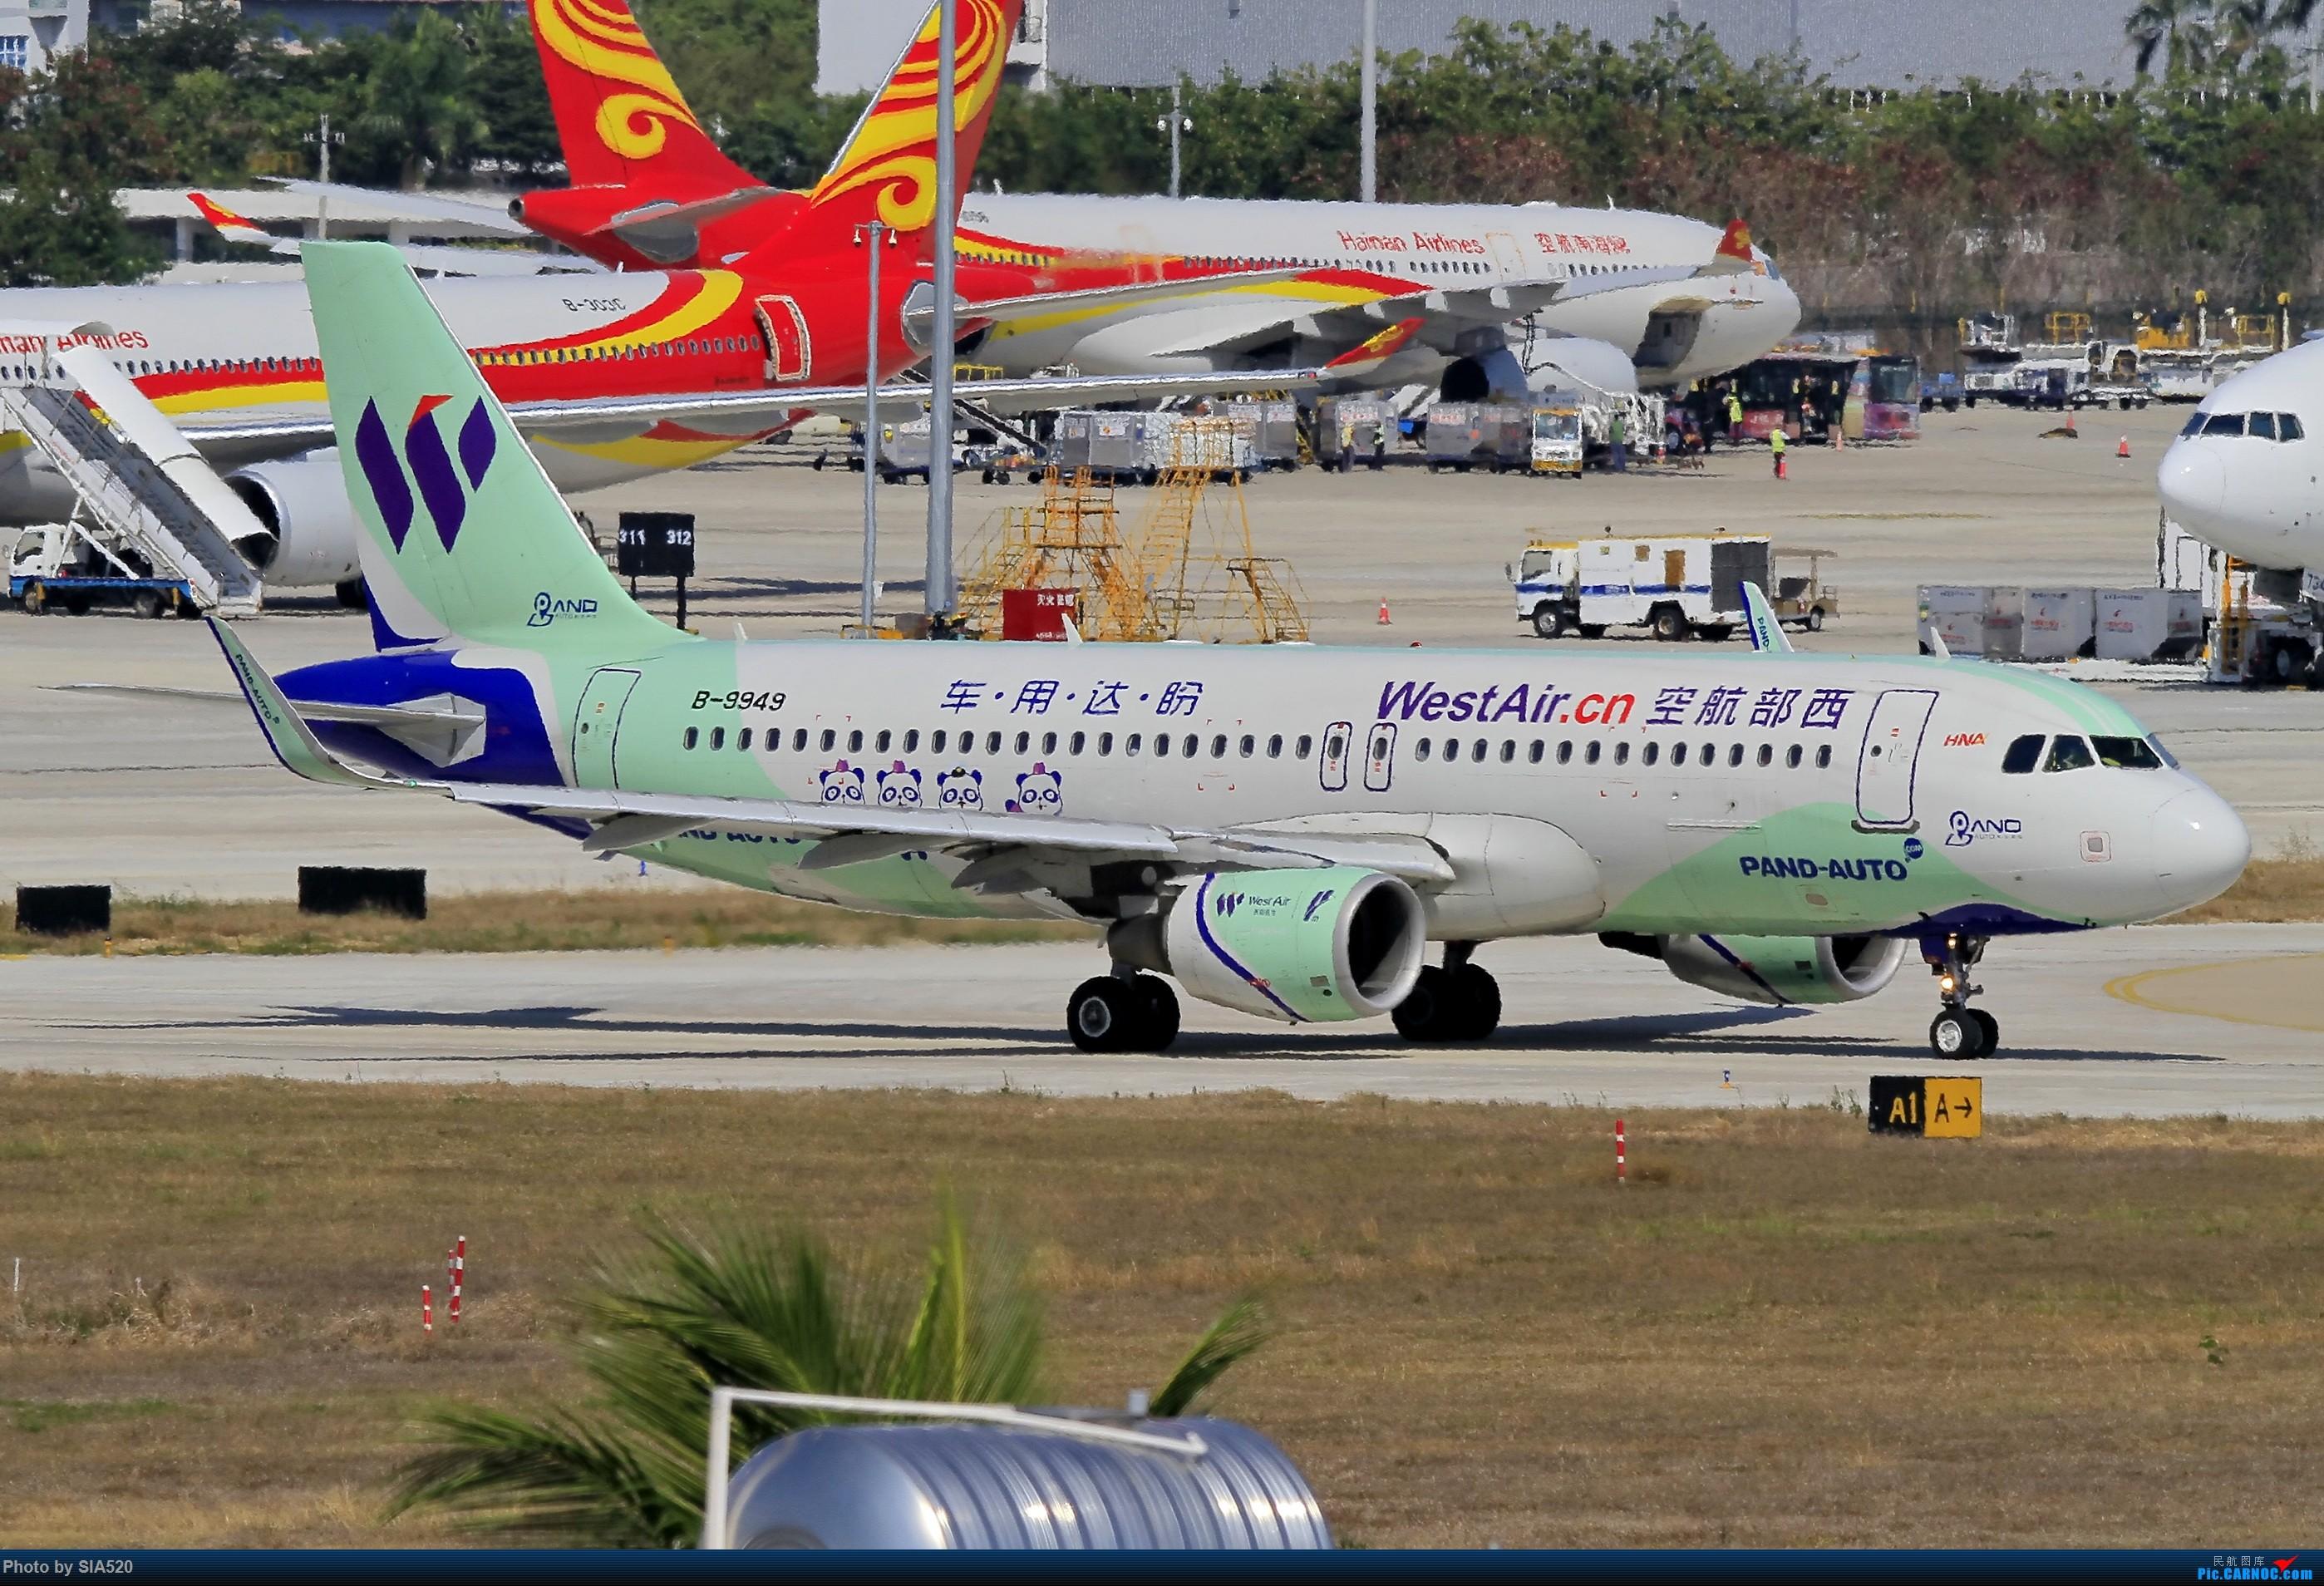 Re:[原创]北京人儿在三亚—600mm解锁凤凰 AIRBUS A320-200 B-9949 中国三亚凤凰国际机场